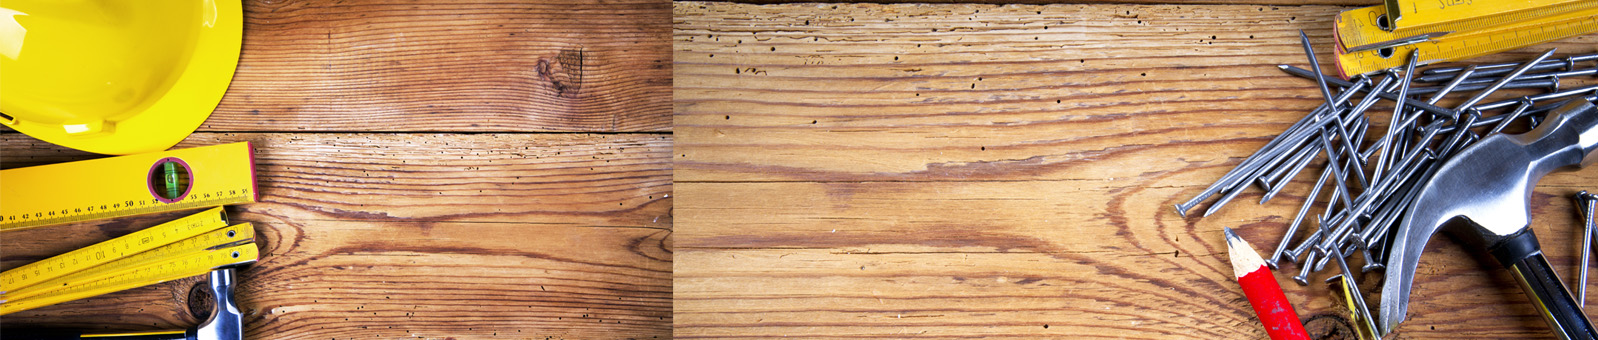 Fond bois outils